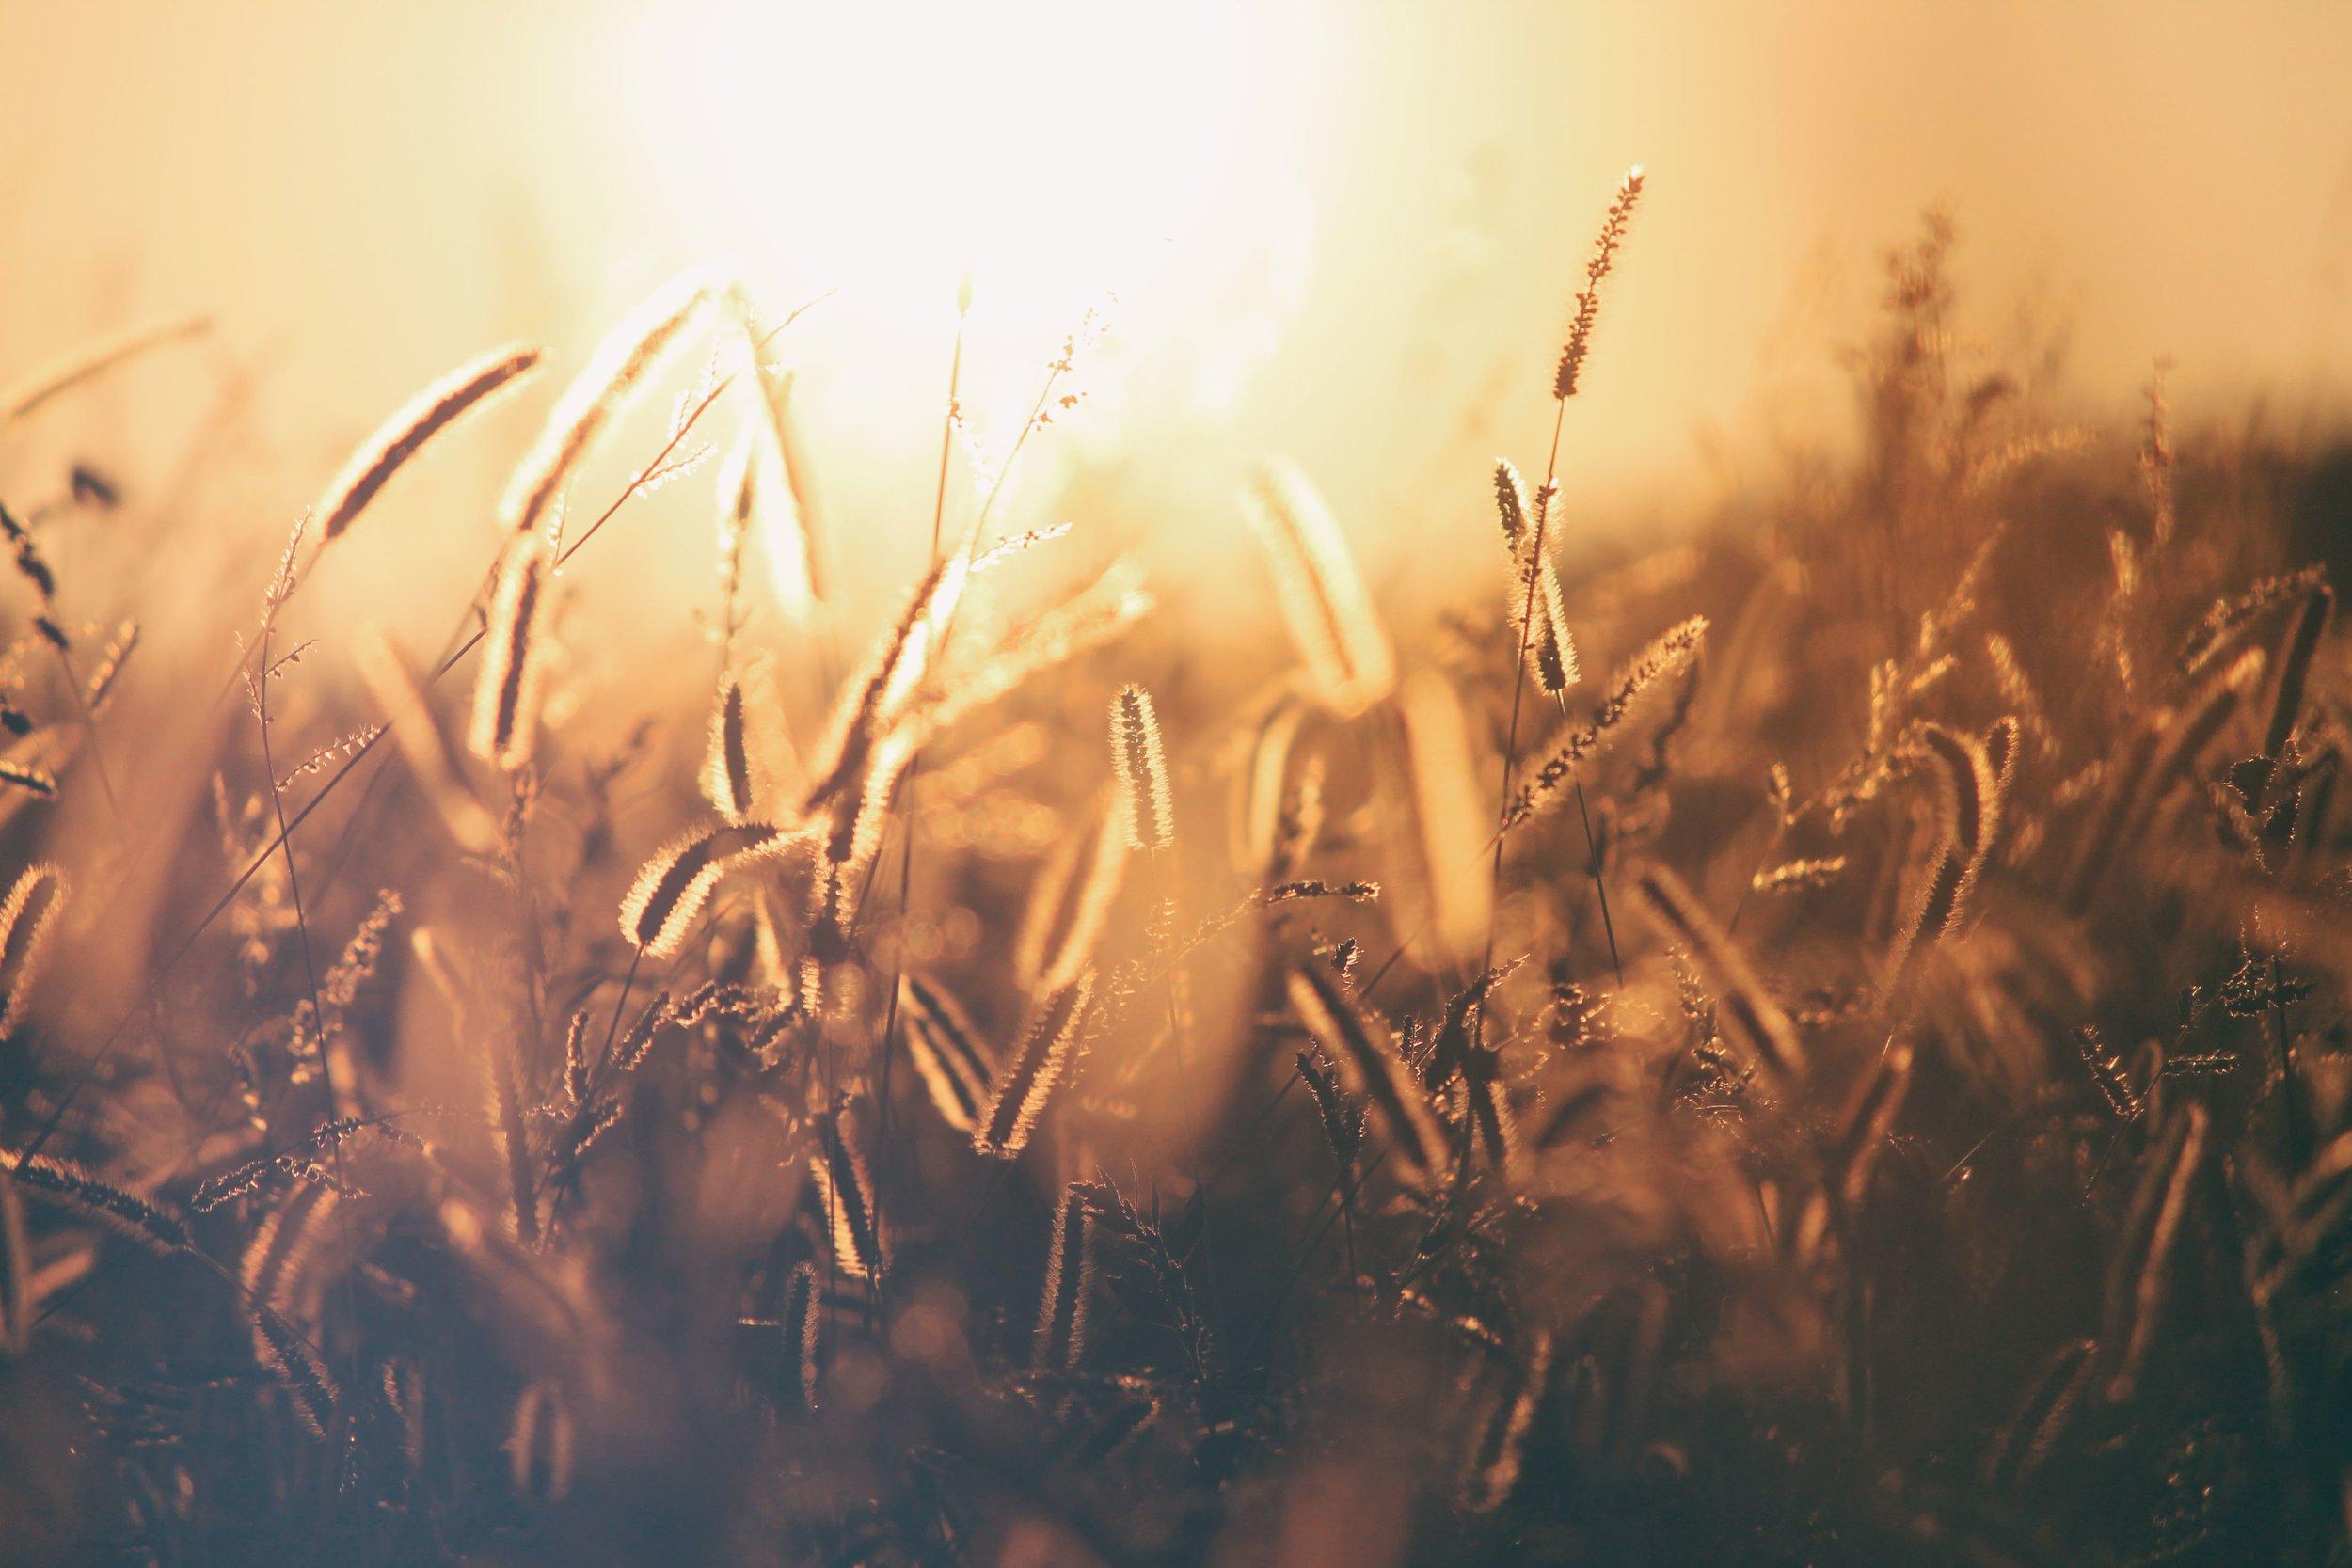 Fertilizer Use & Rules - byIndiana State Chemist & Seed Commissioner